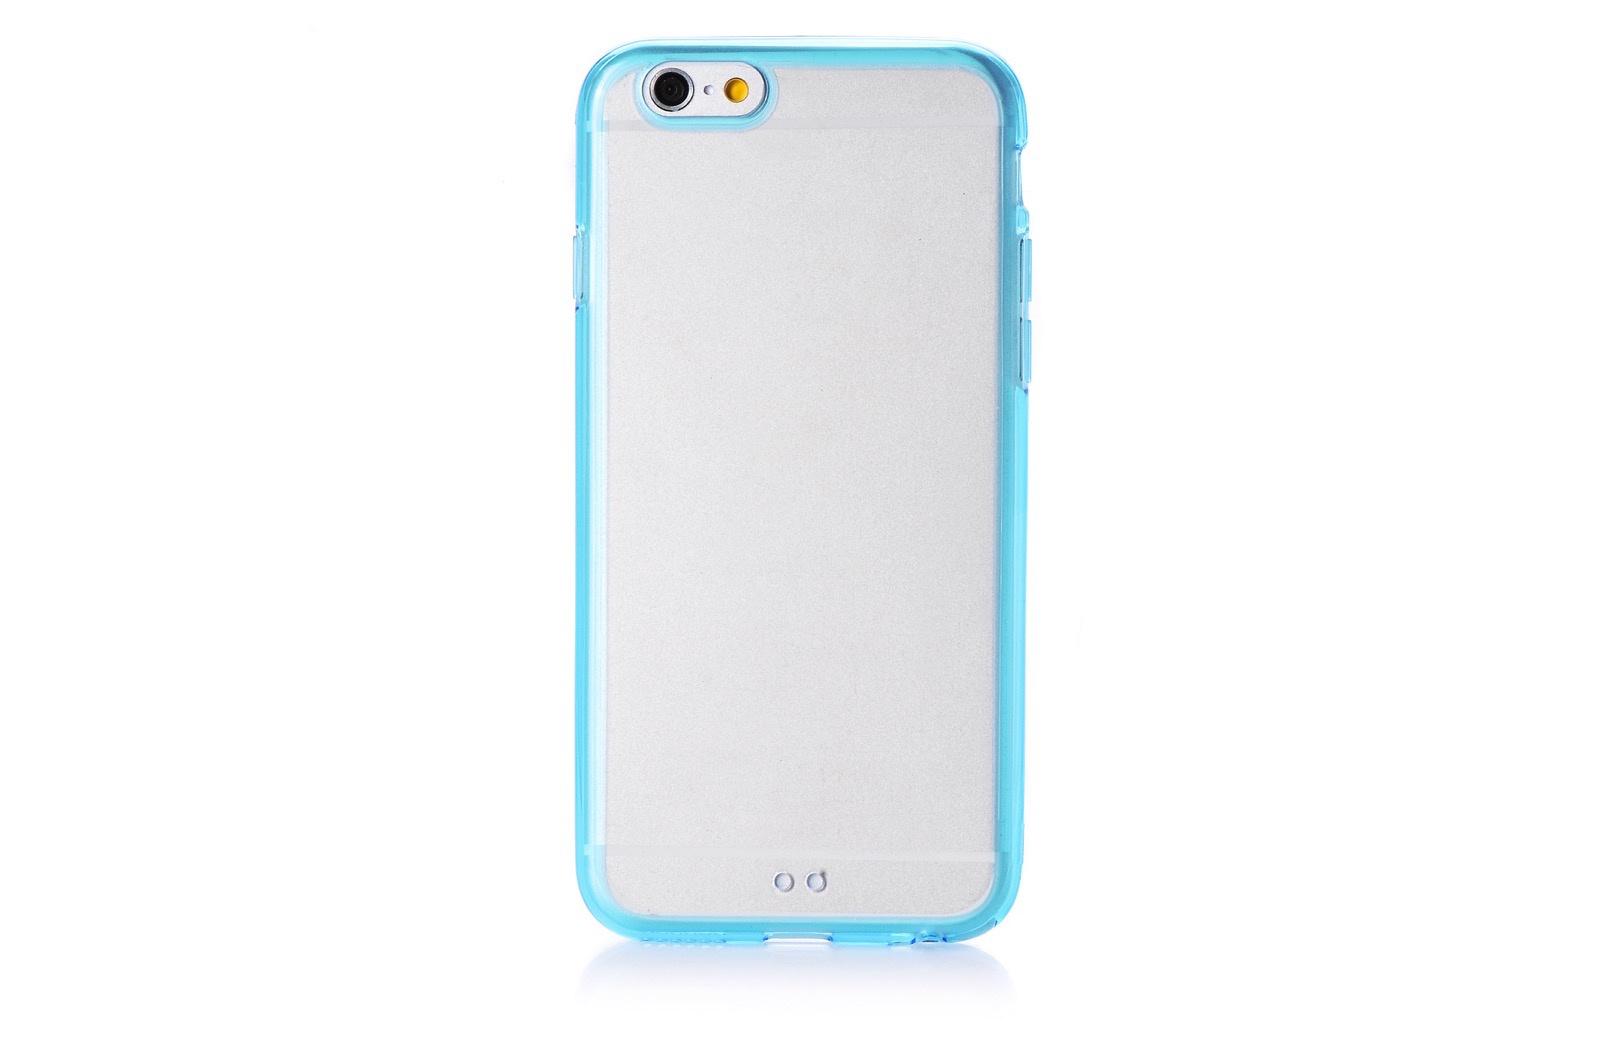 "Чехол для сотового телефона Gurdini Чехол накладка iPhone 6/6S 4.7"" Gurdini Lims 2, 580046, бирюзовый"